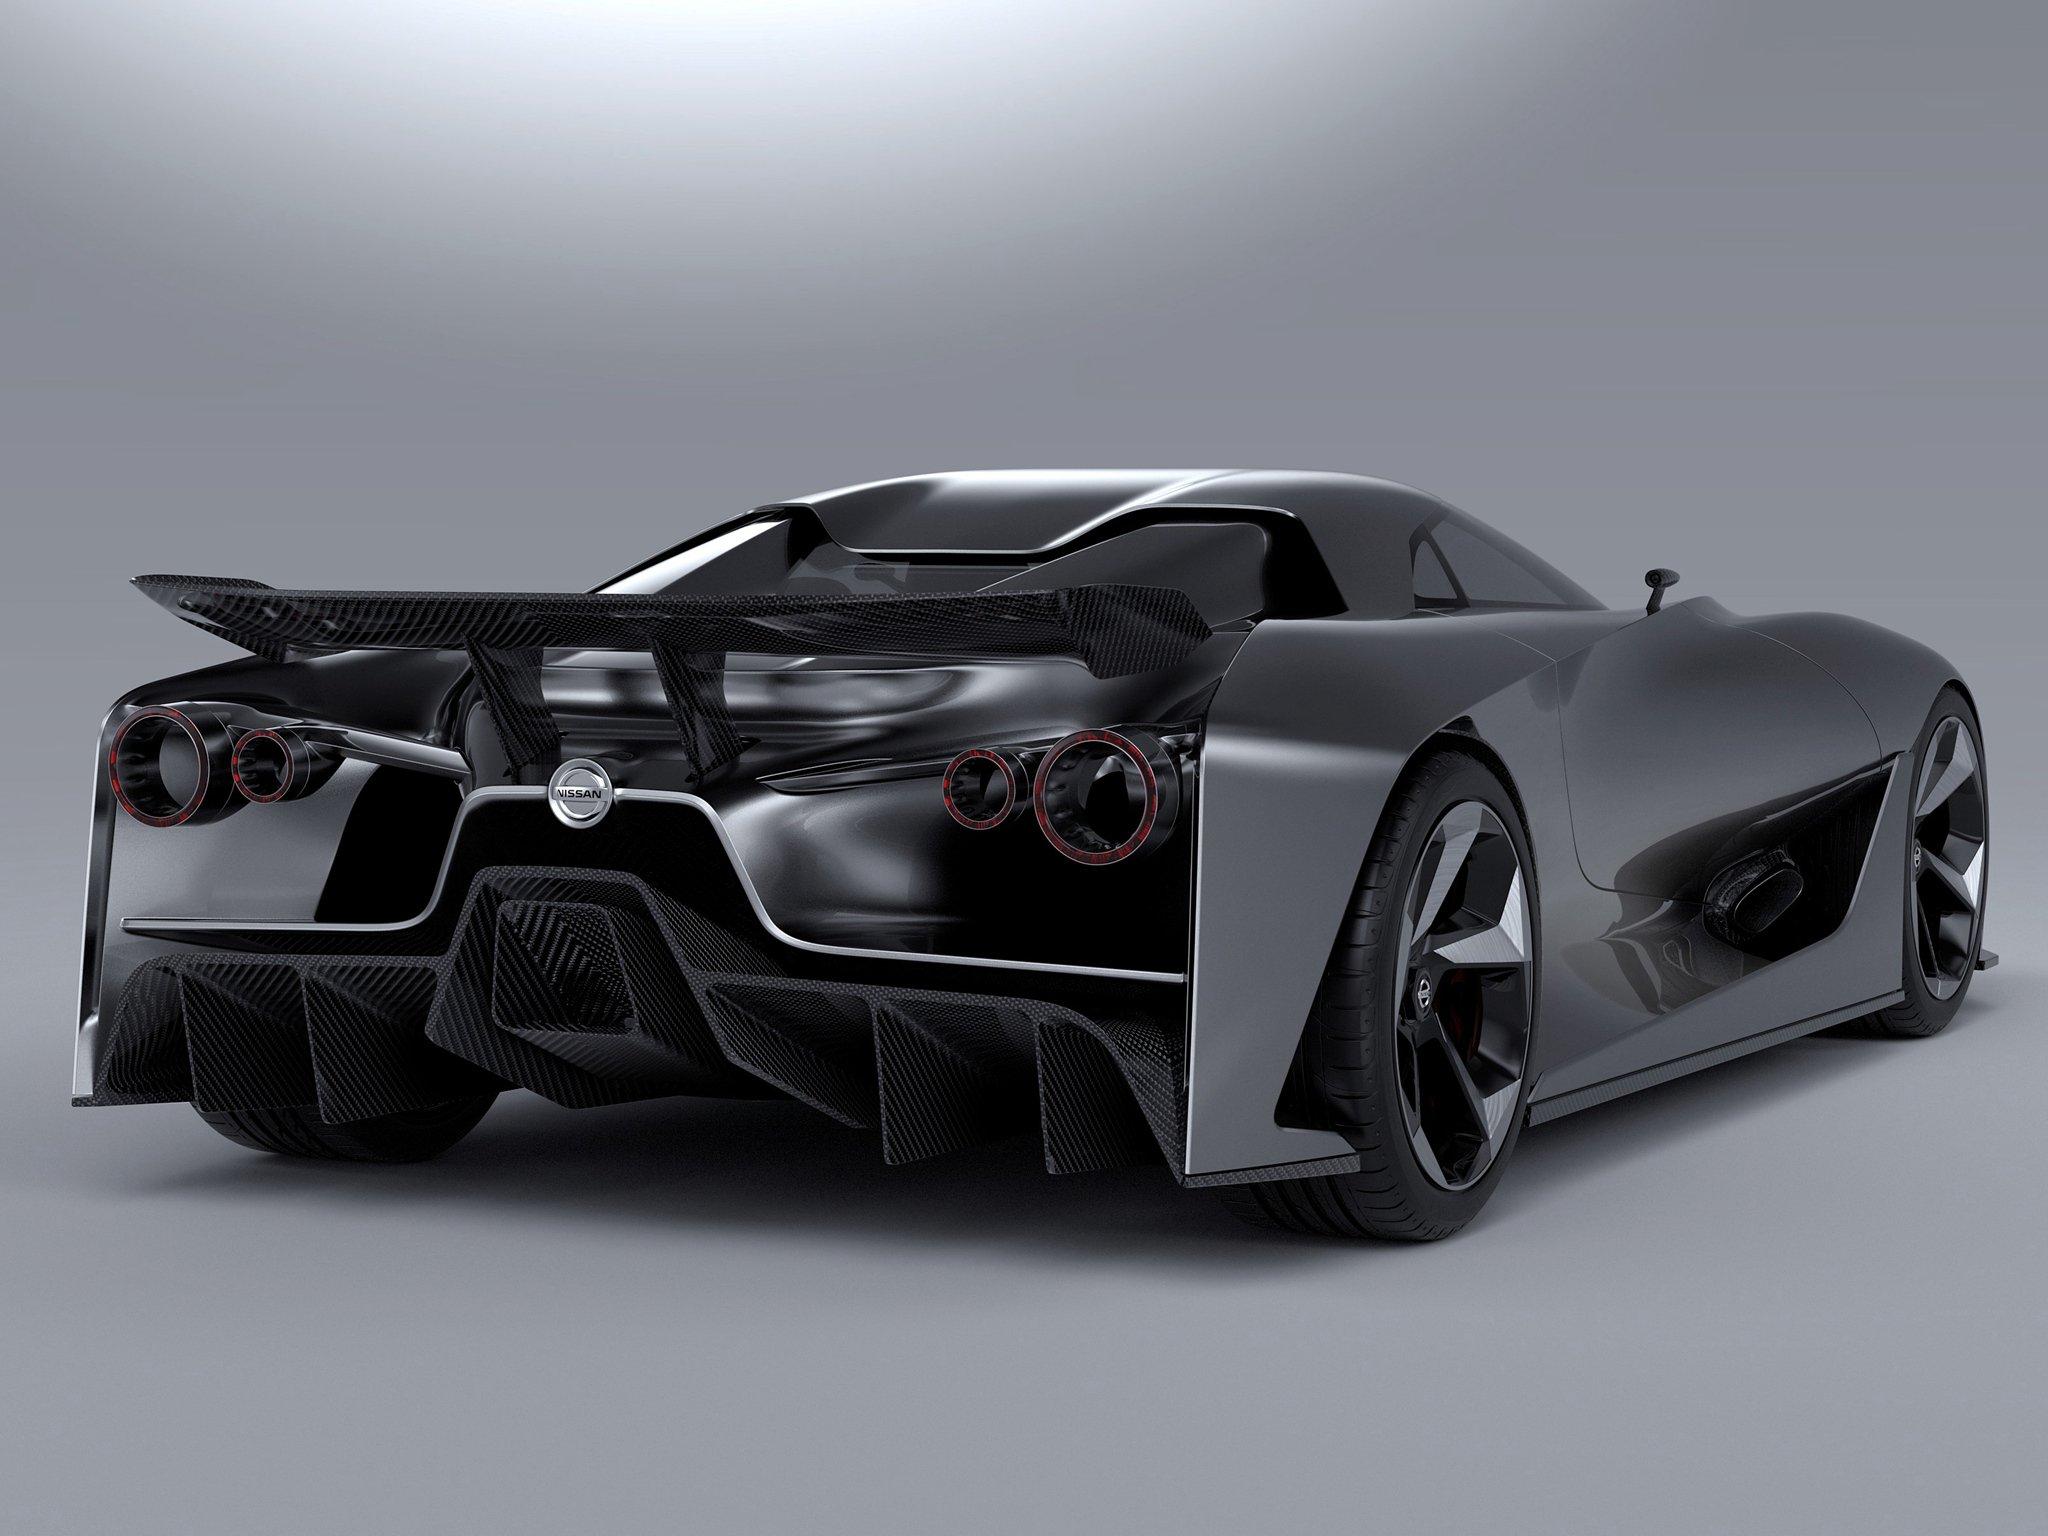 Nissan Concept Vision Gran Turismo Supercar F Wallpaper